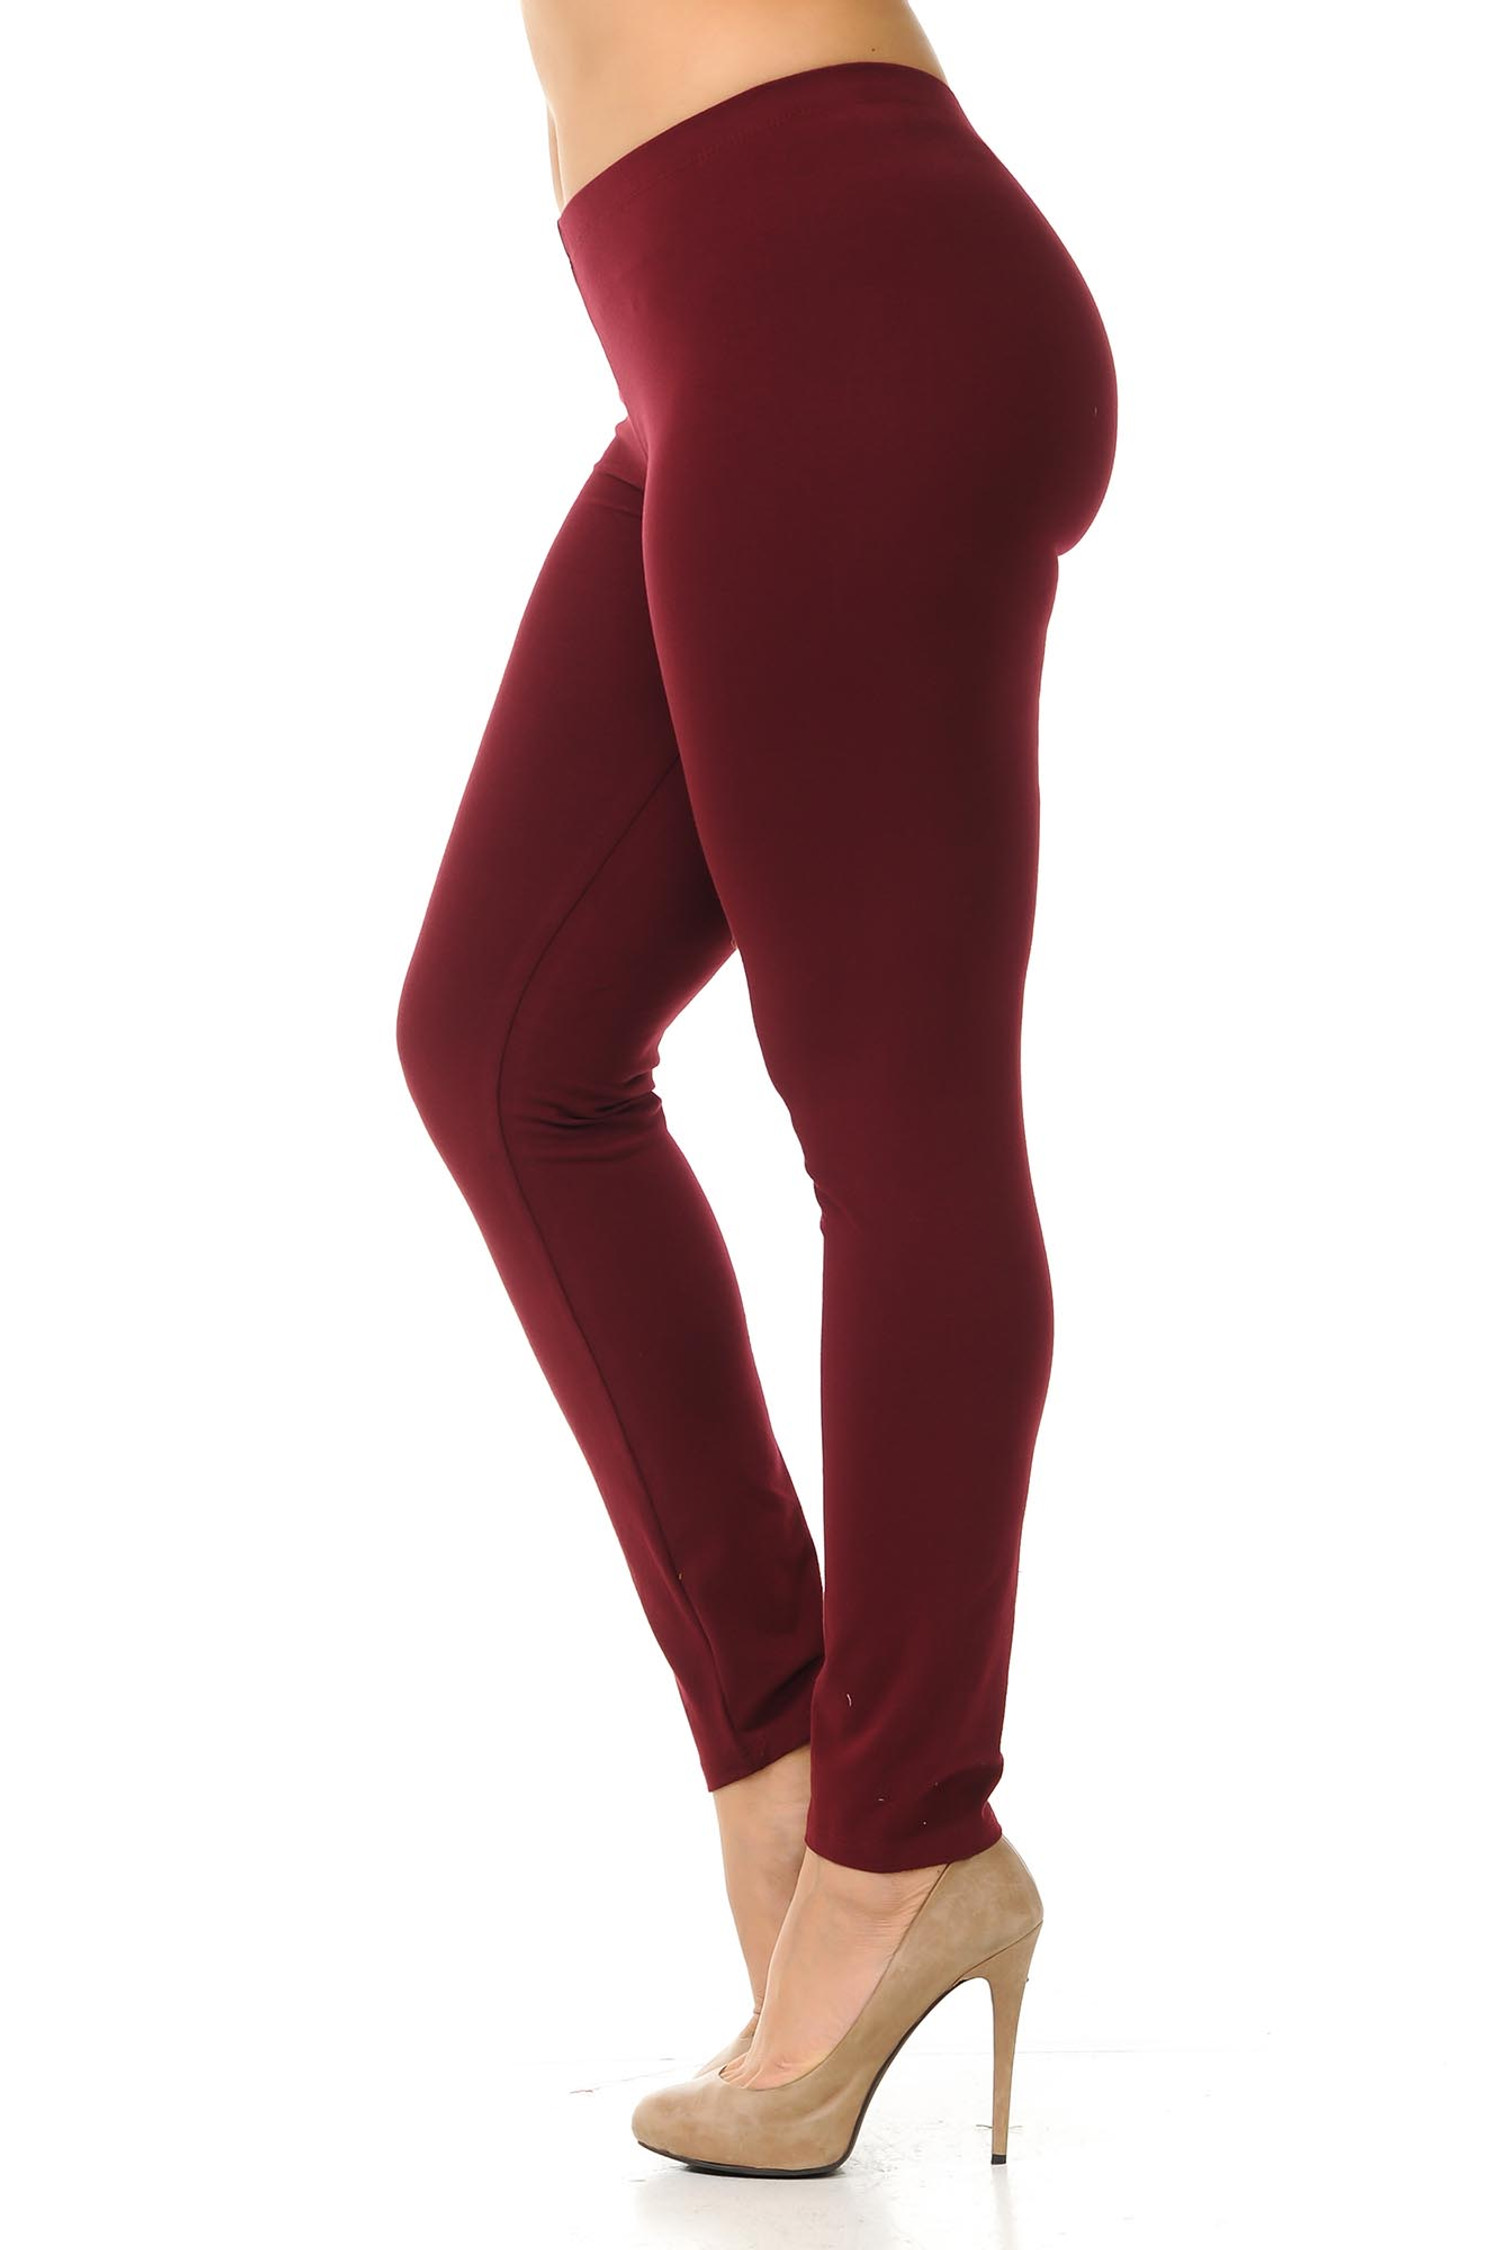 Left side view of  burgundy plus size USA Cotton Full Length Leggings.